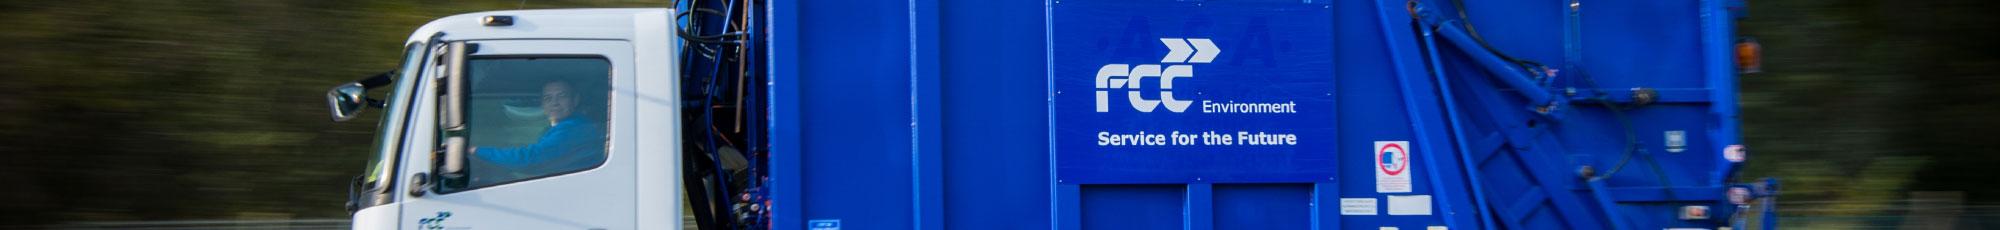 abfall-container-abholen-muellwagen